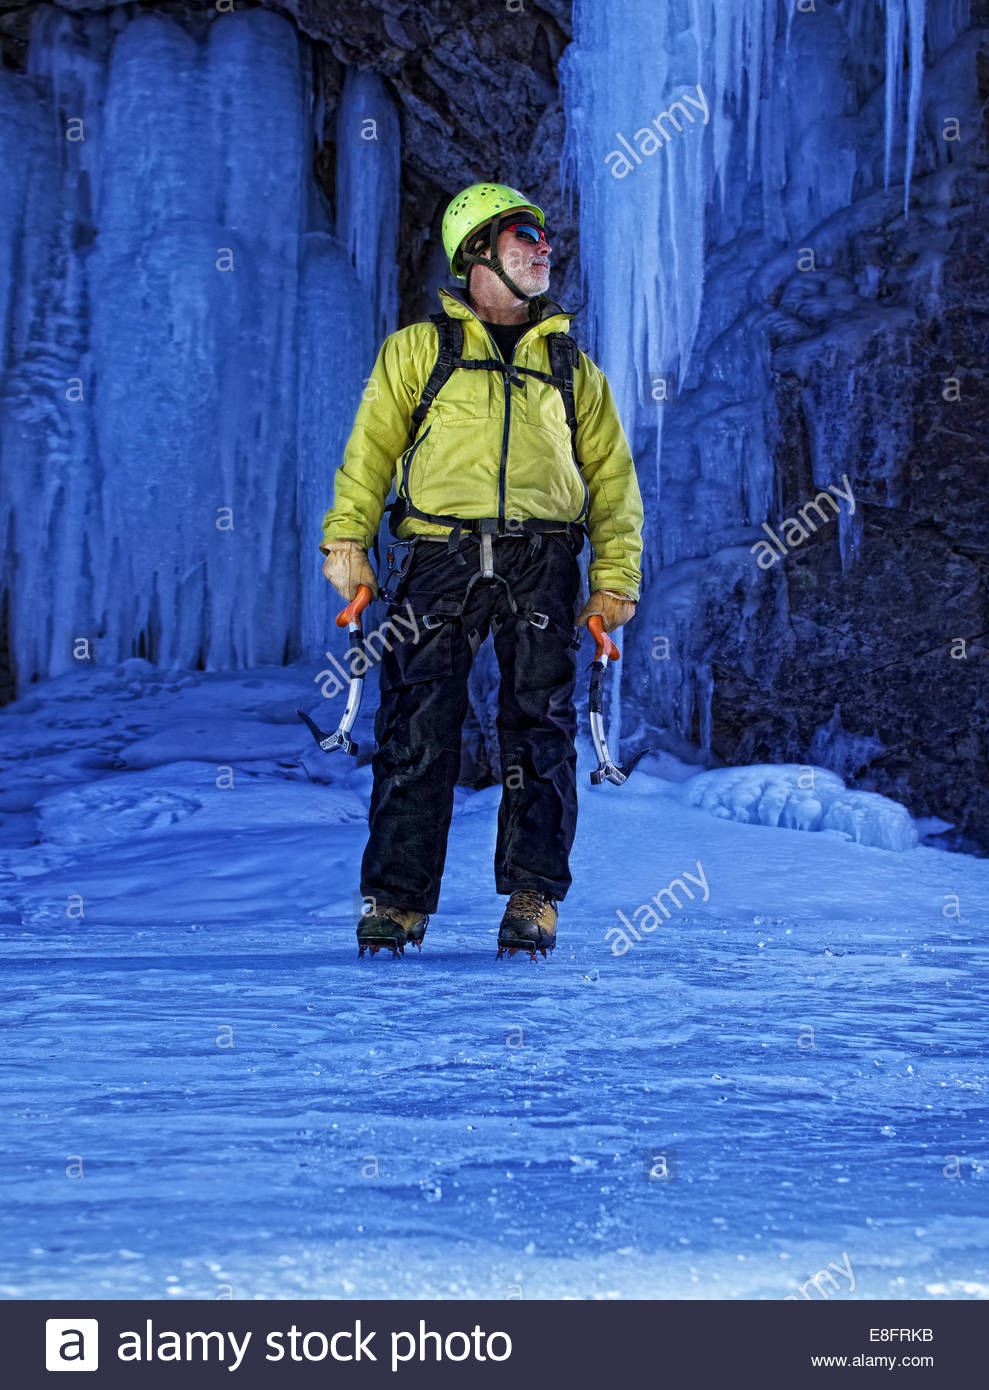 USA, Colorado, Lake City, Portrait of ice climber - Stock Image